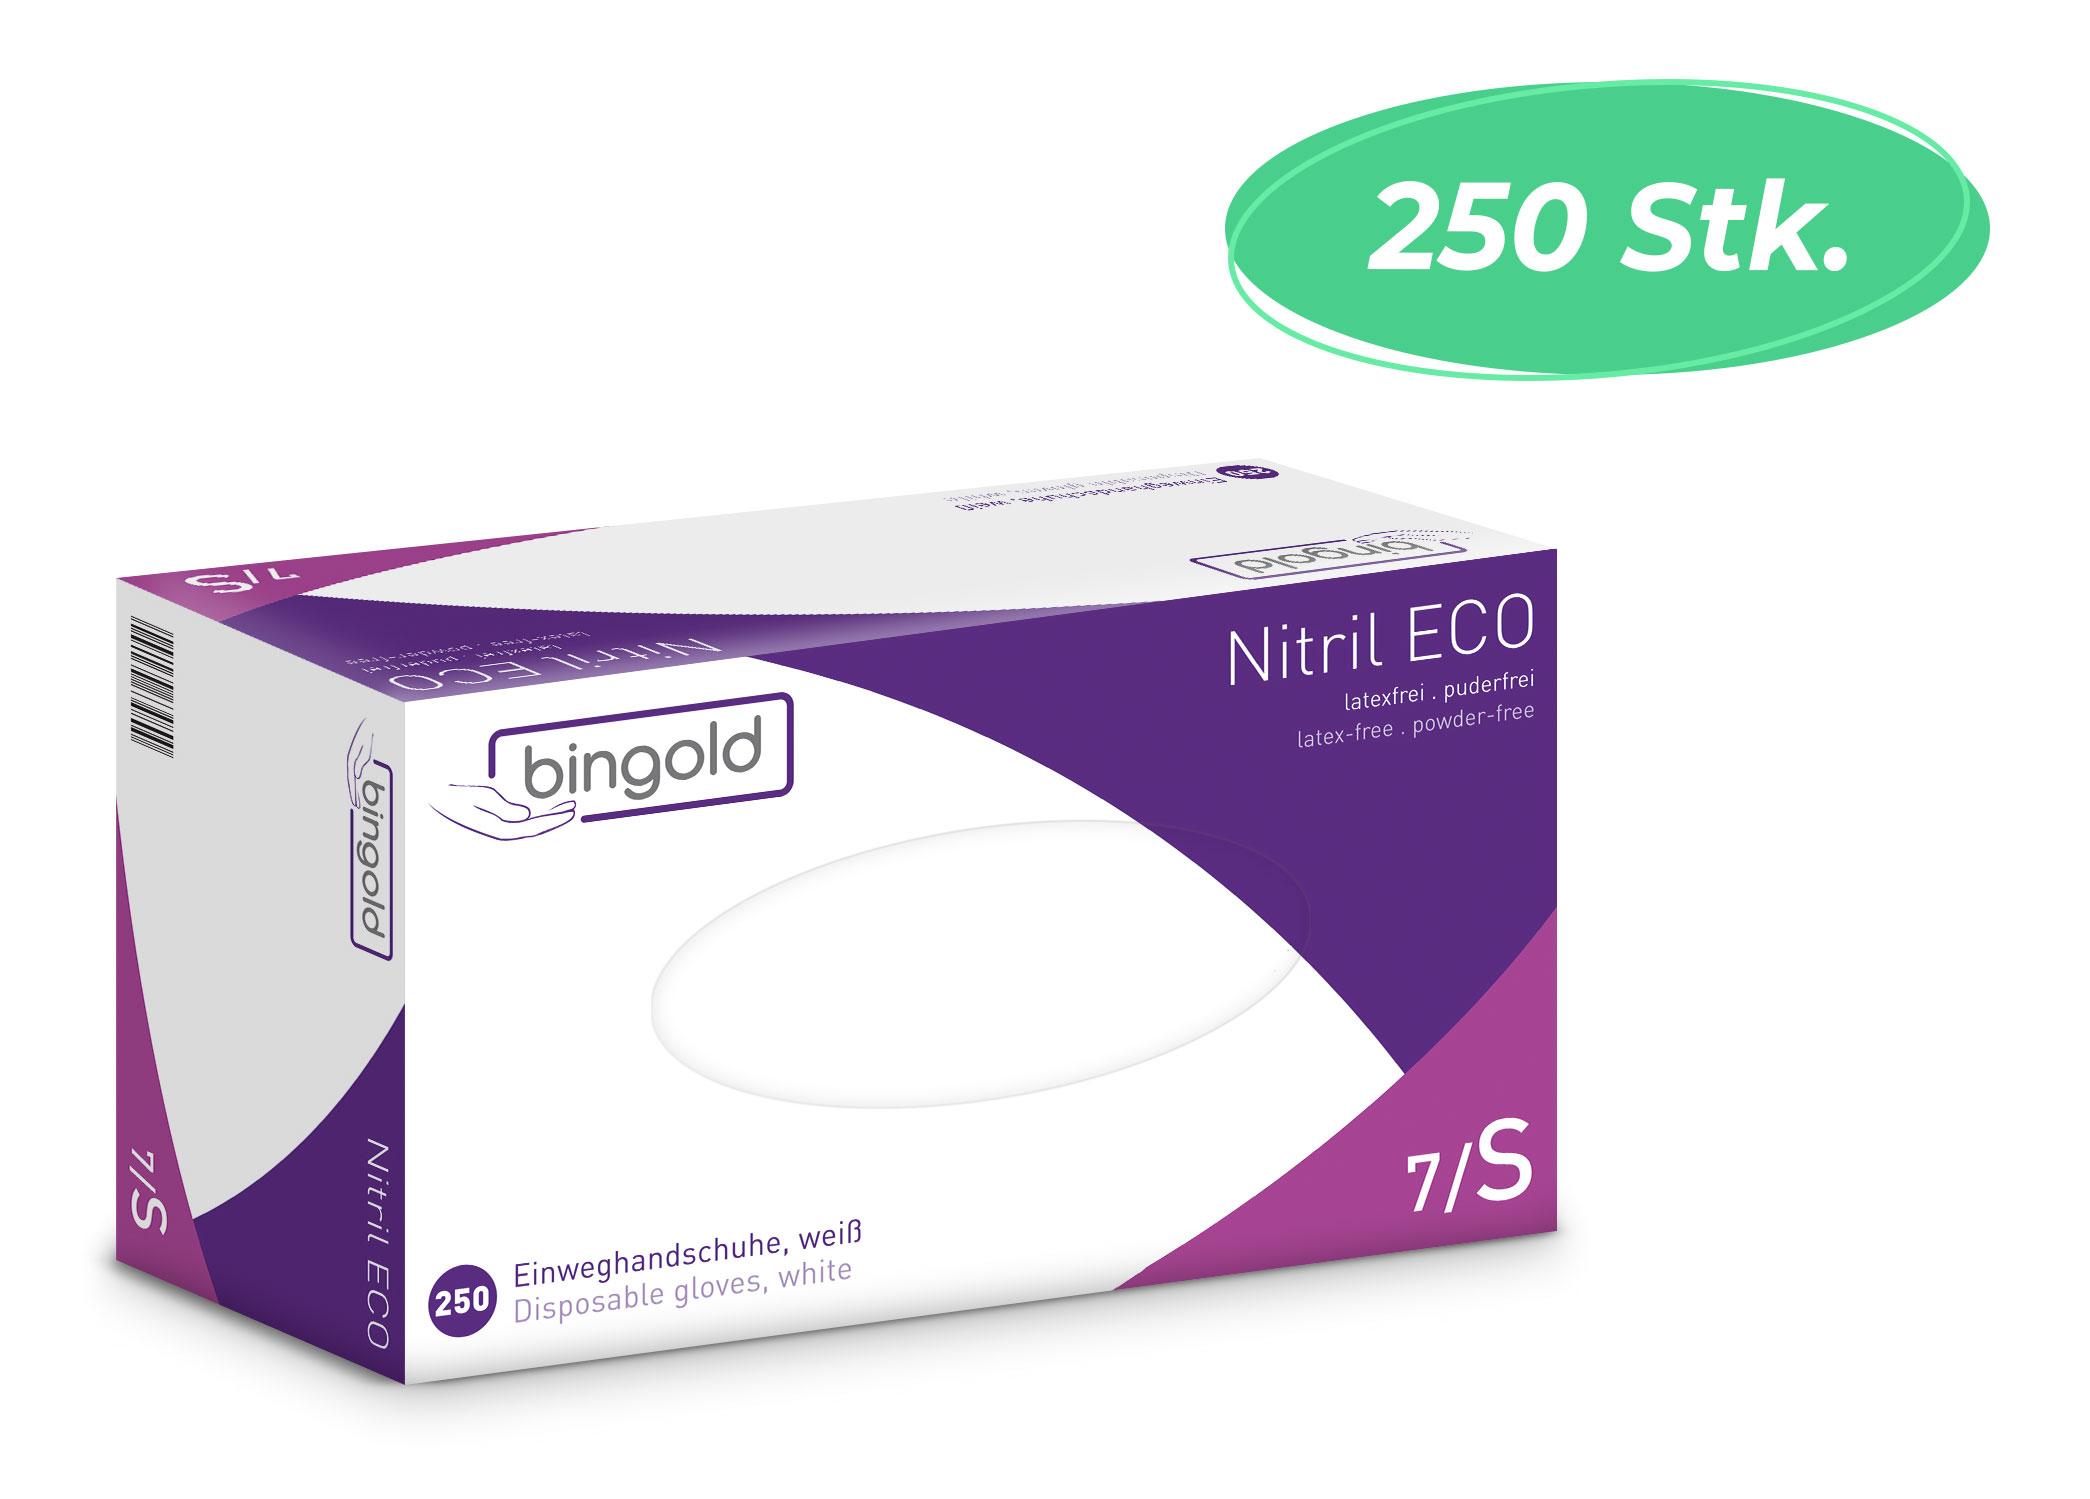 Bingold Nitril ECO - Nitrilhandschuhe - 250 St.